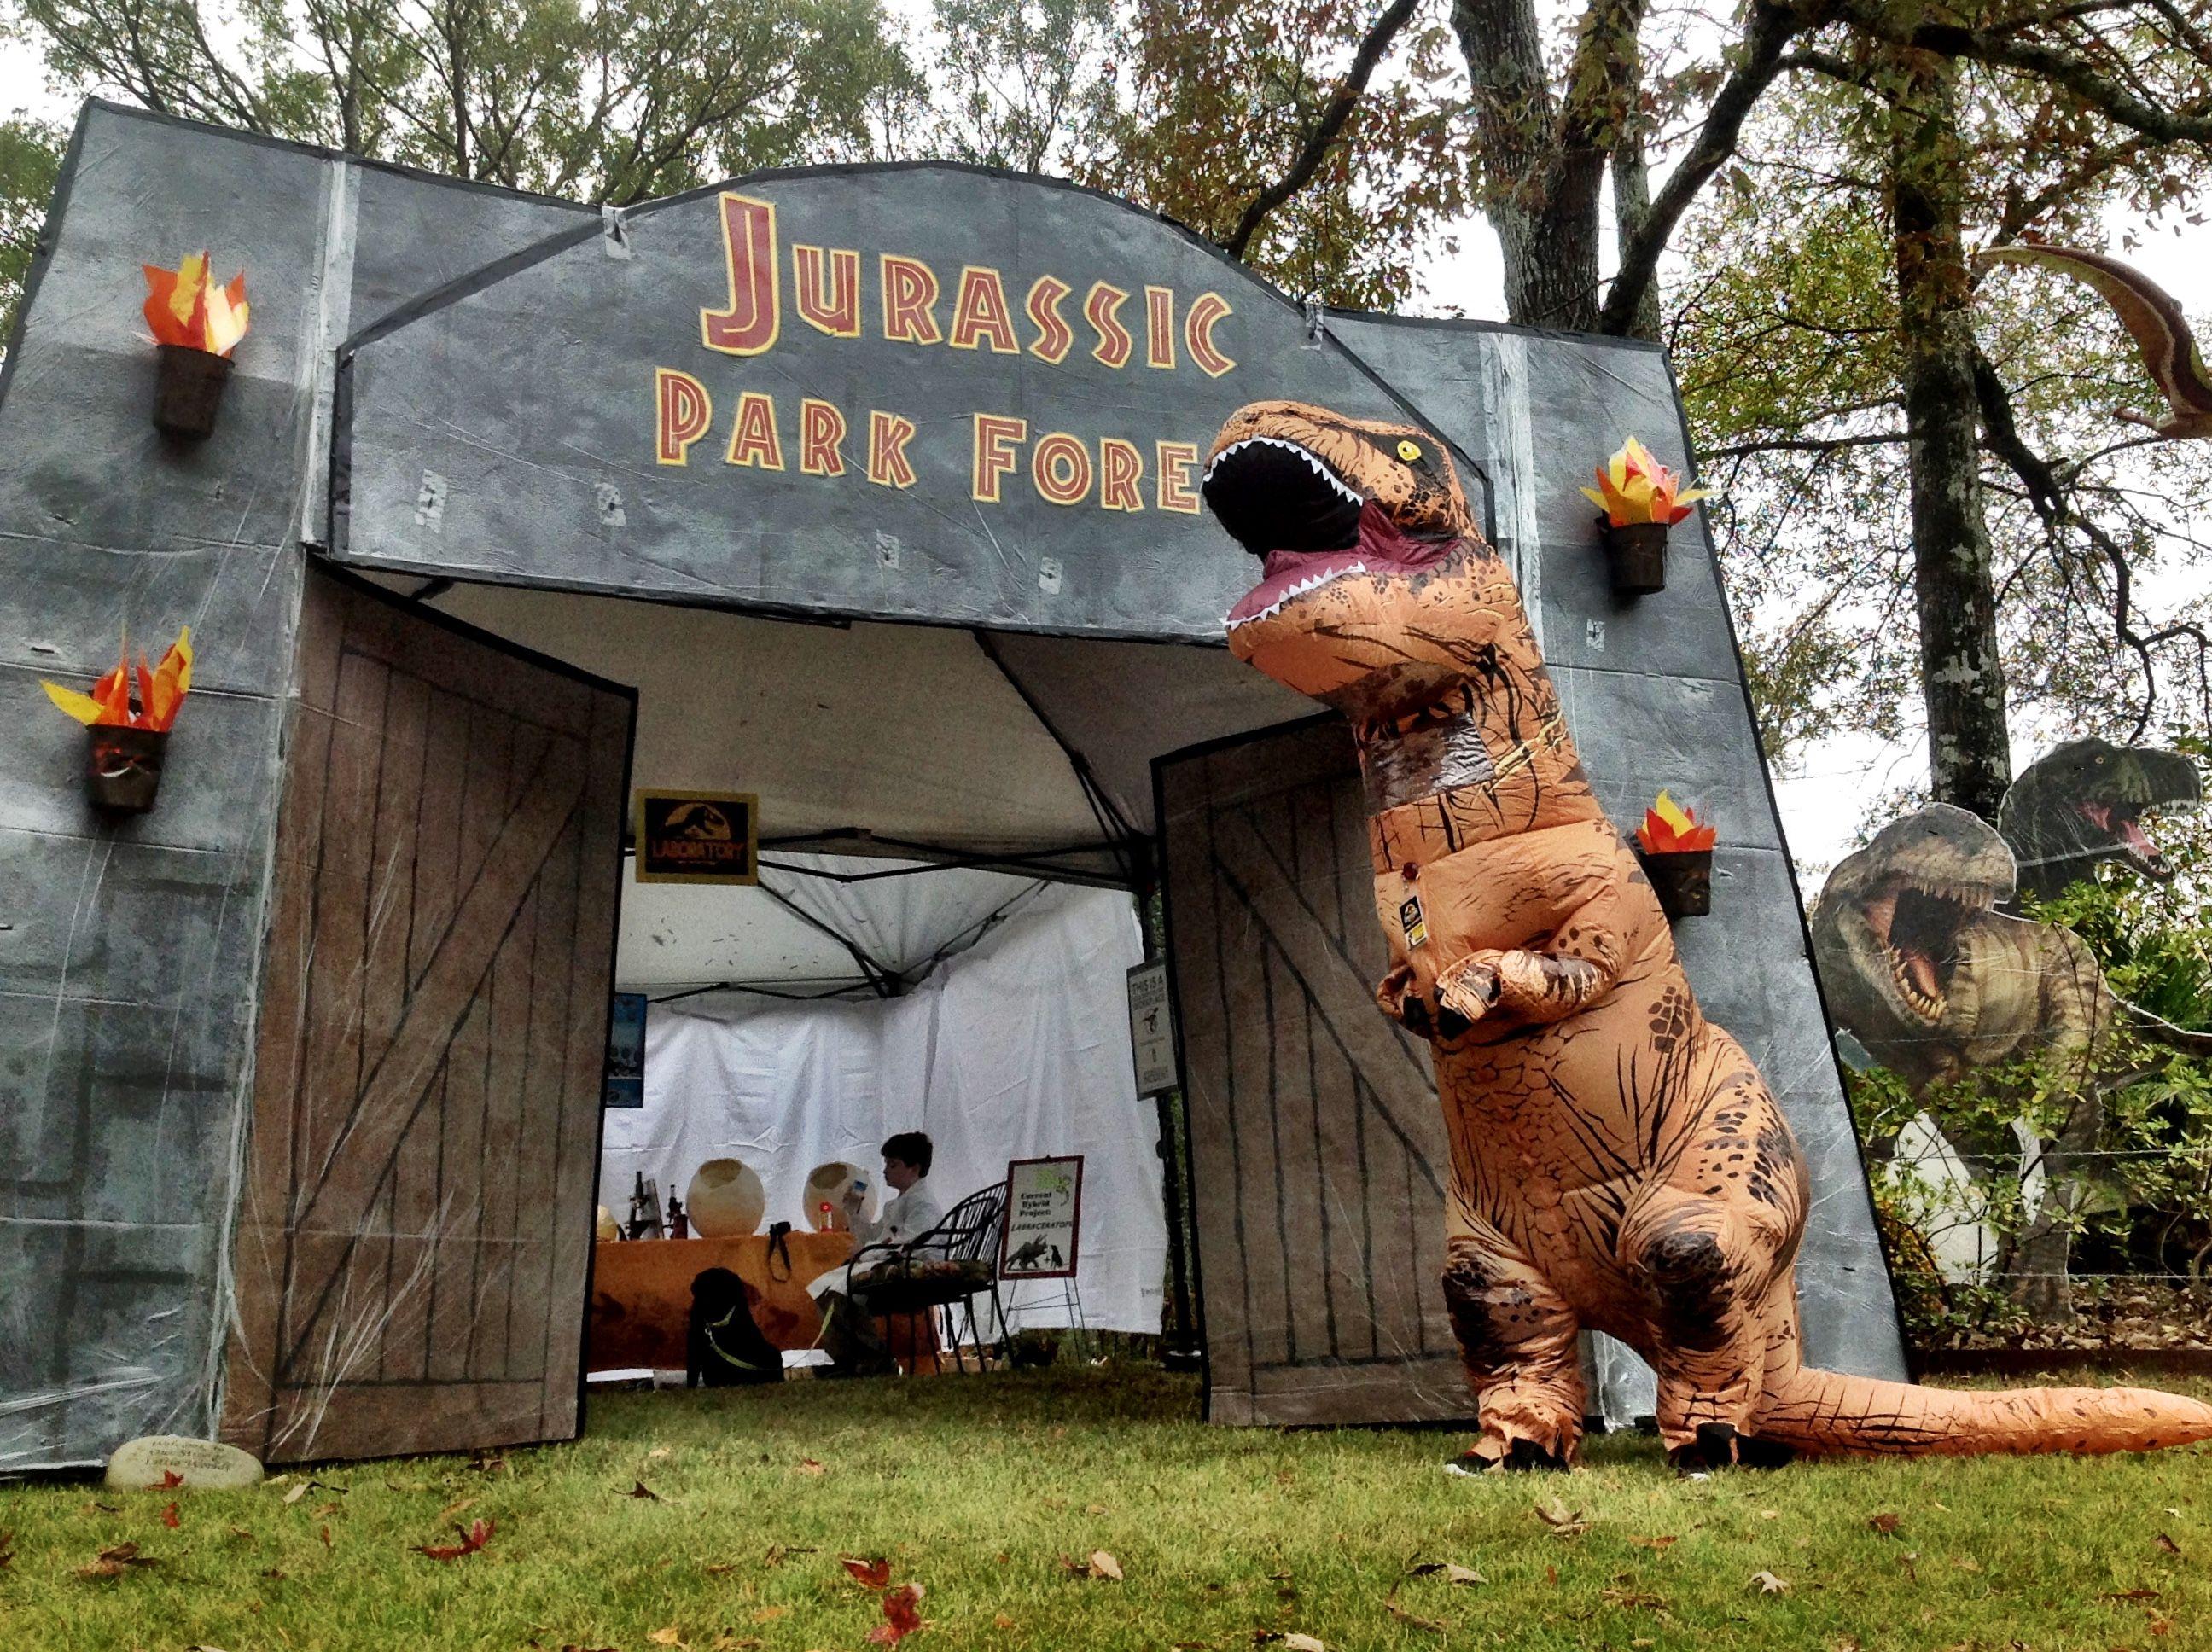 parkforesthalloween Jurassic park theme Halloween yard